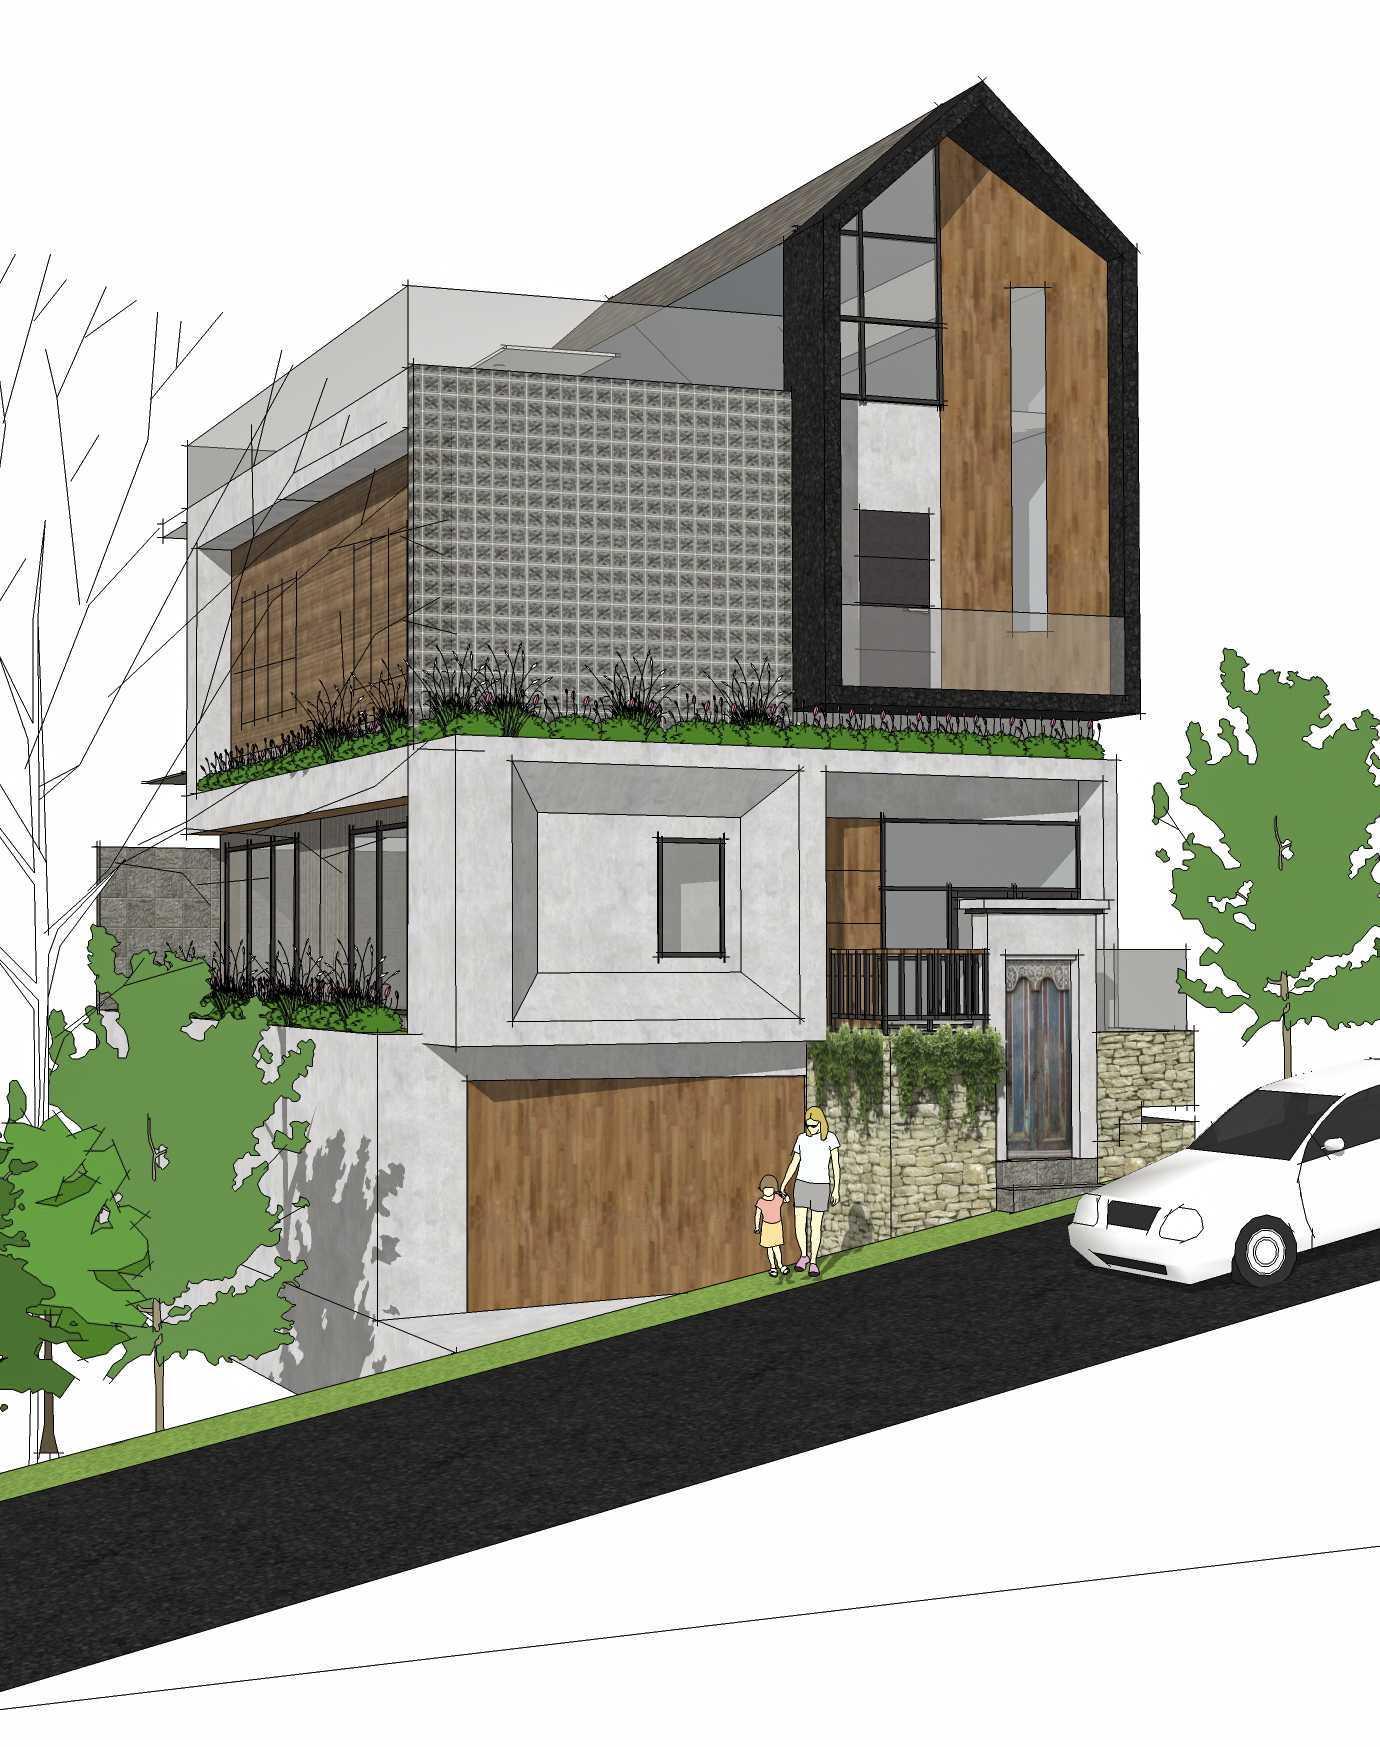 Bicons Design And Construction Mekar Bhuwana 4 Storey Private Residence Kabupaten Badung, Bali, Indonesia Kabupaten Badung, Bali, Indonesia Bicons-Design-And-Construction-Mekar-Bhuwana-4-Storey-Private-Residence   63988